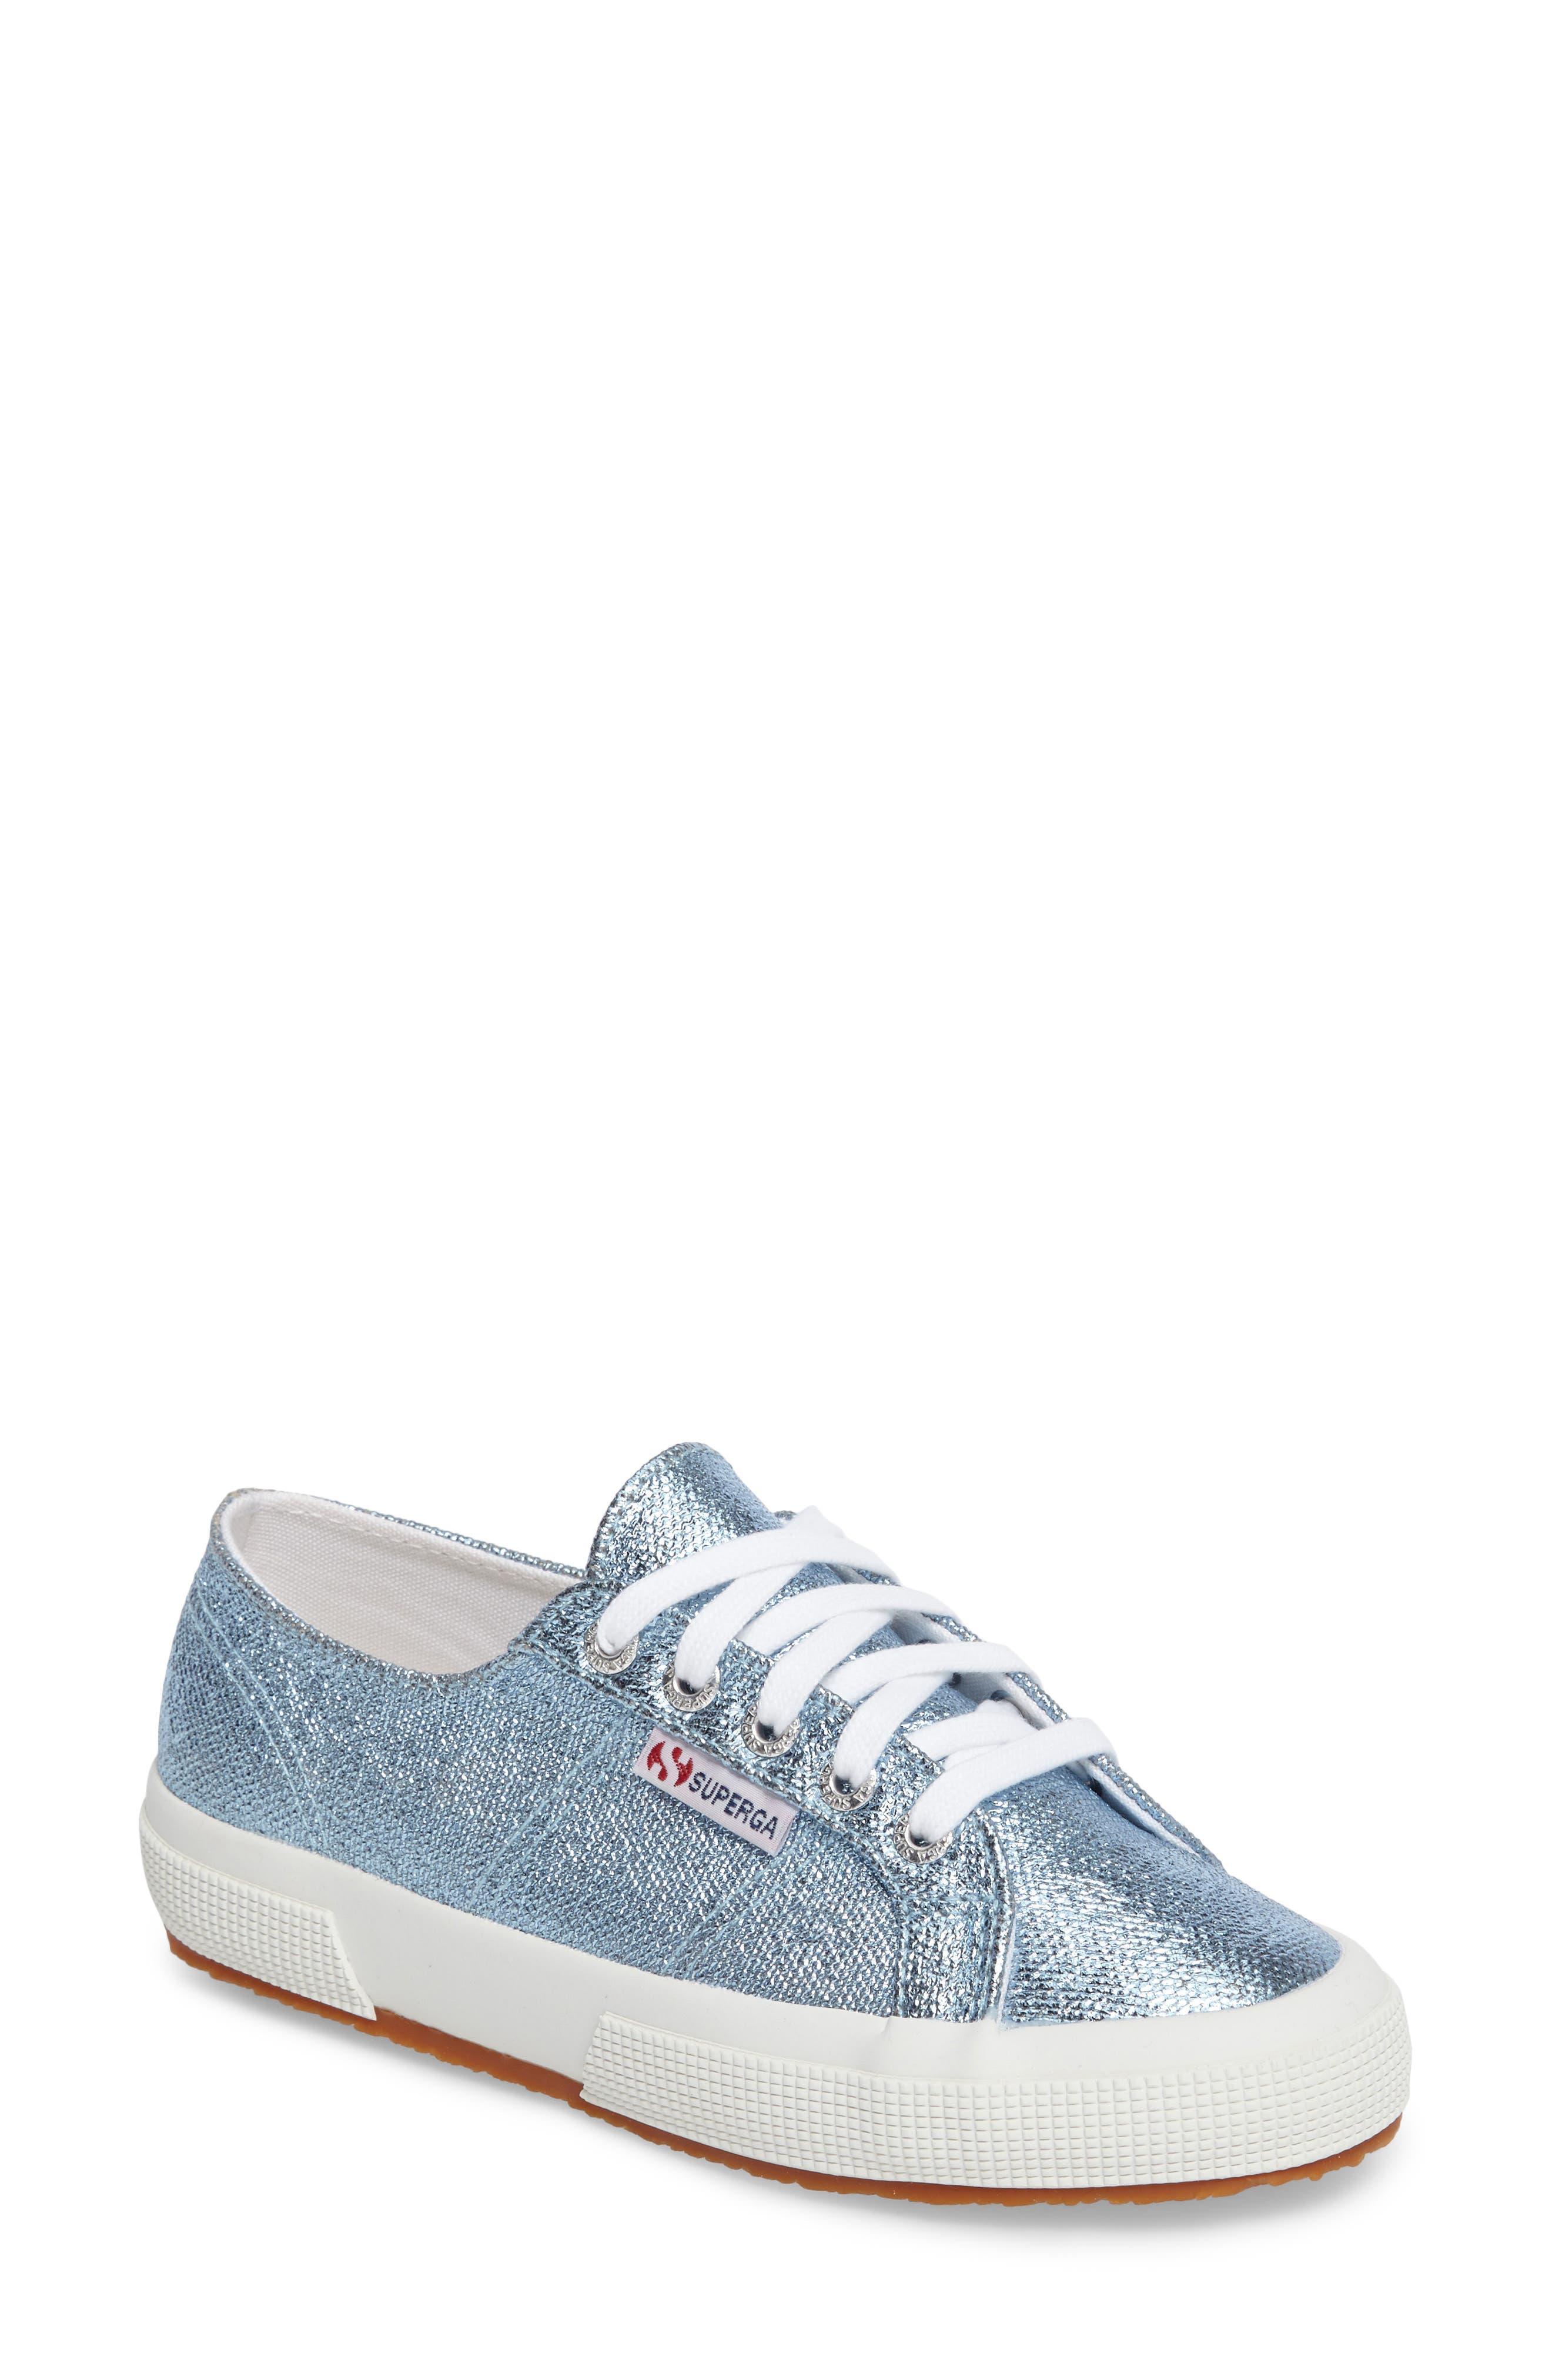 2750 Metallic Sneaker,                         Main,                         color, Light Blue